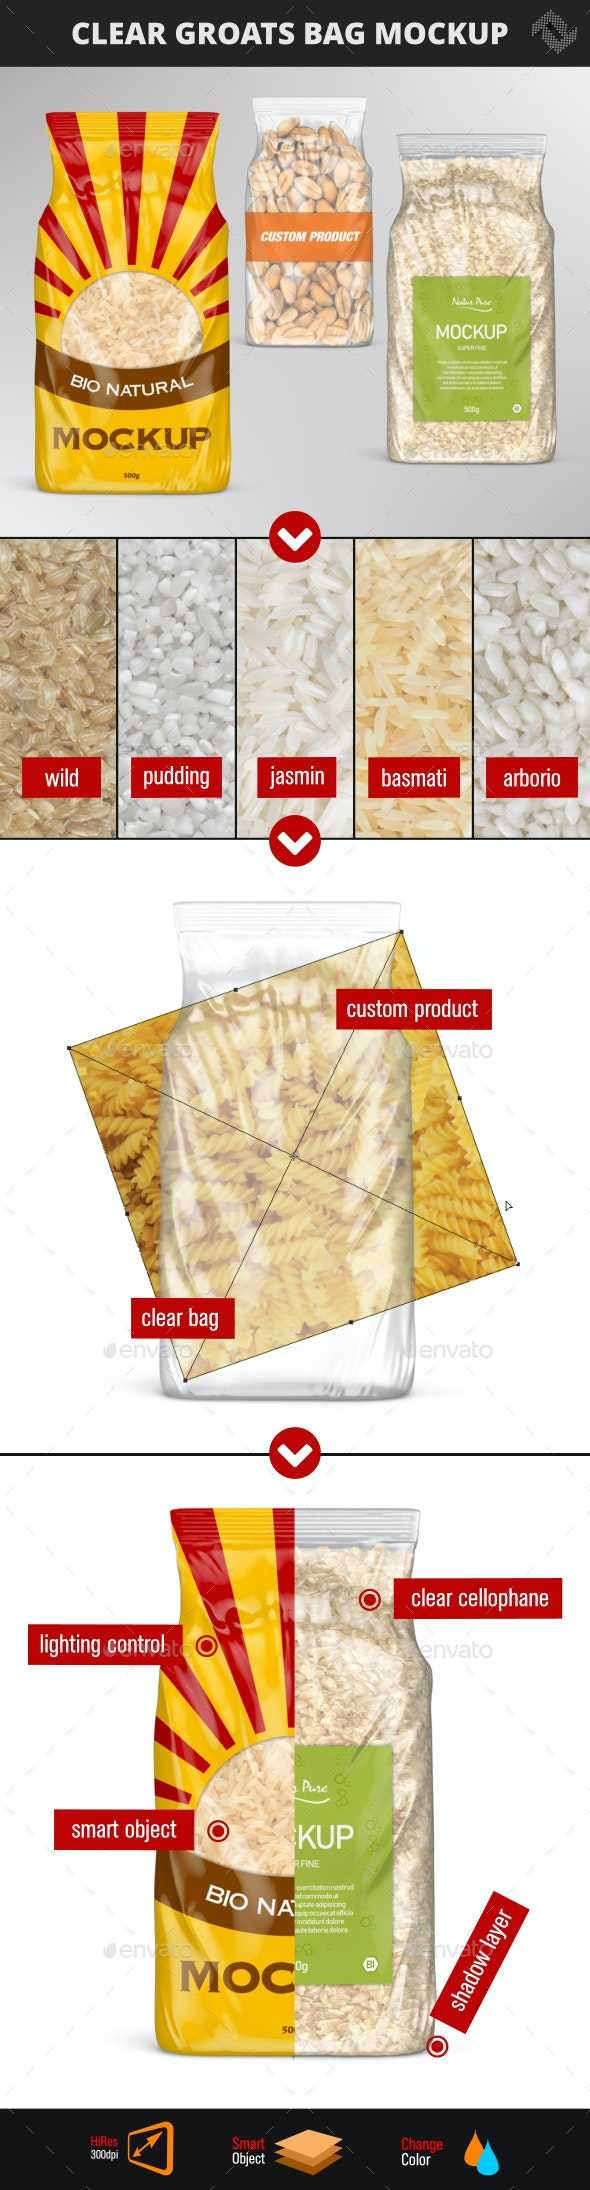 Clear Plastic Rice Bag Mockup - Product Mock-Ups Graphics